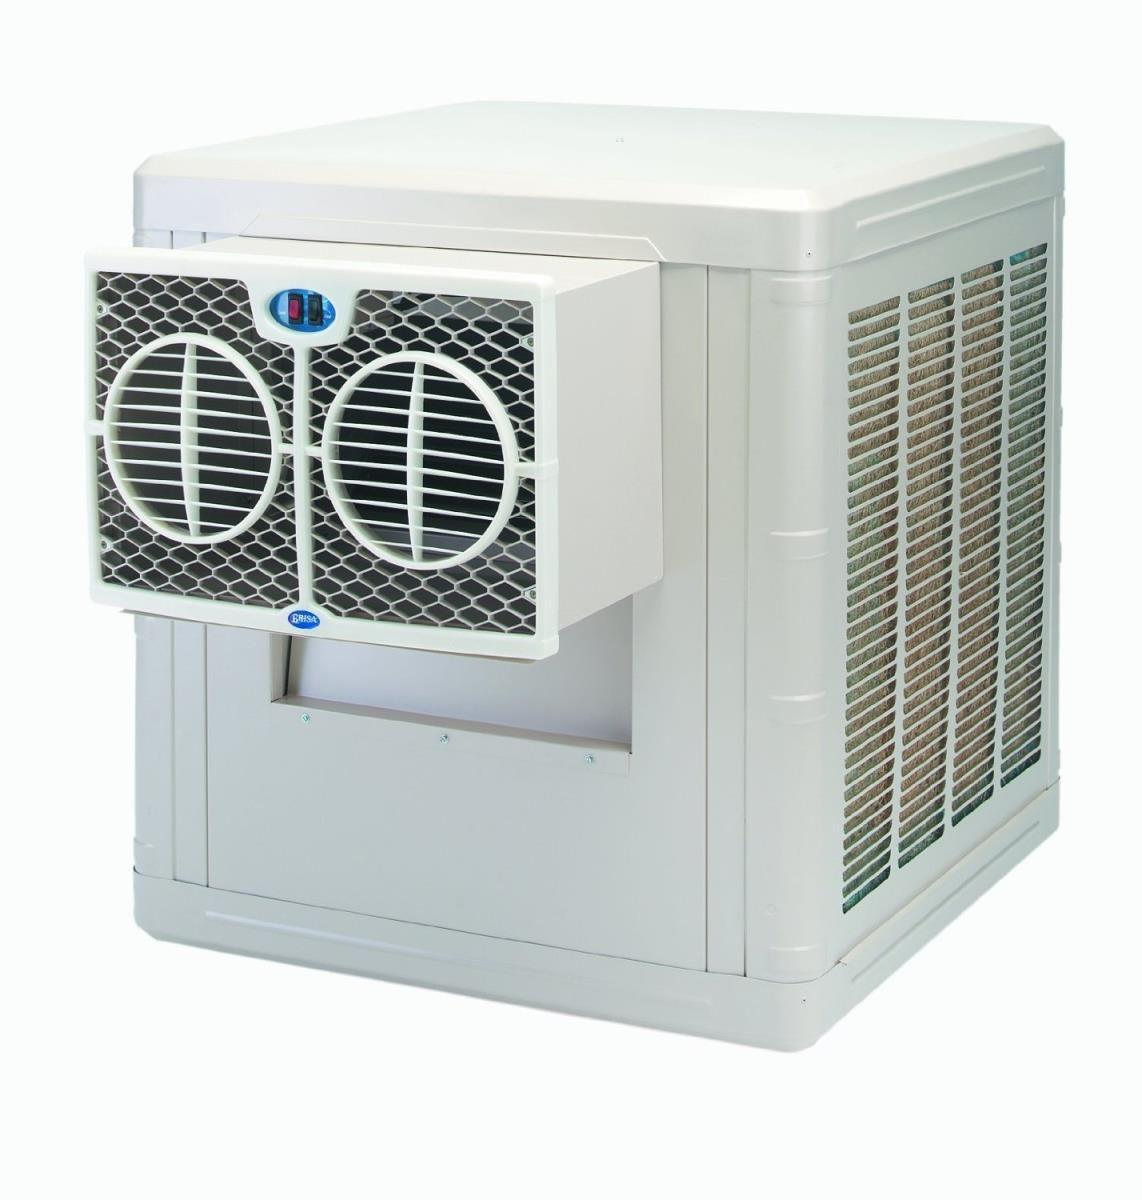 404 Not Found Evaporative Cooler Swamp Cooler Evaporative Air Cooler